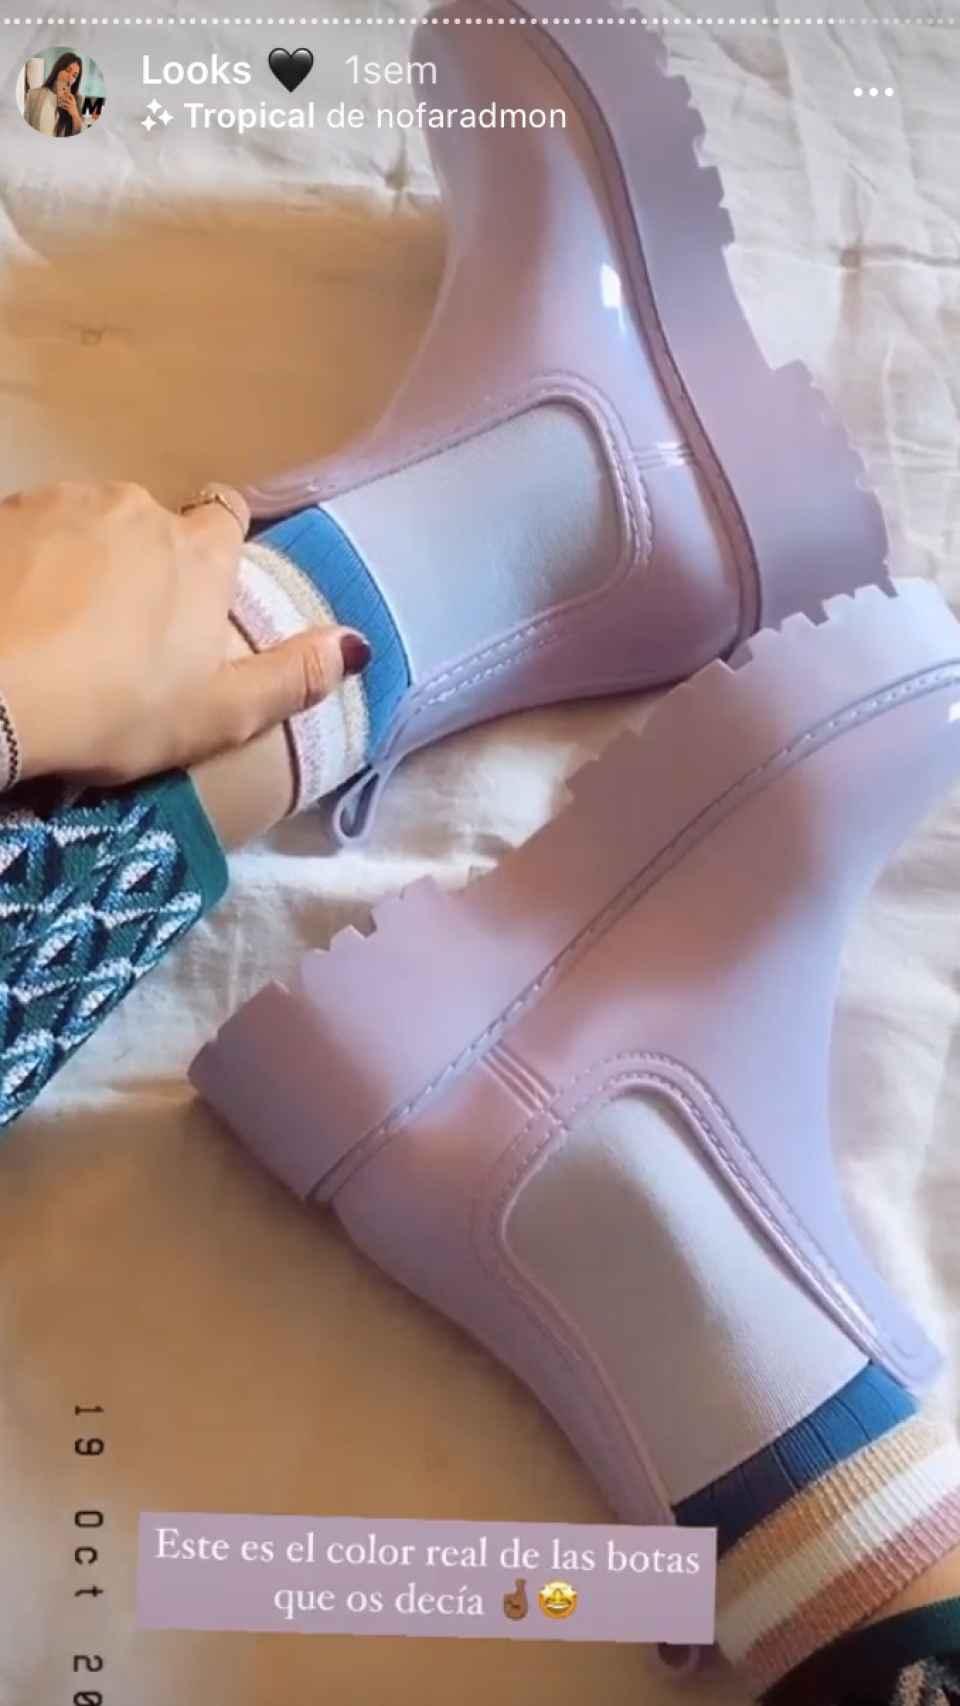 Las botas de agua de Asos que han conquistado a María García de Jaime.